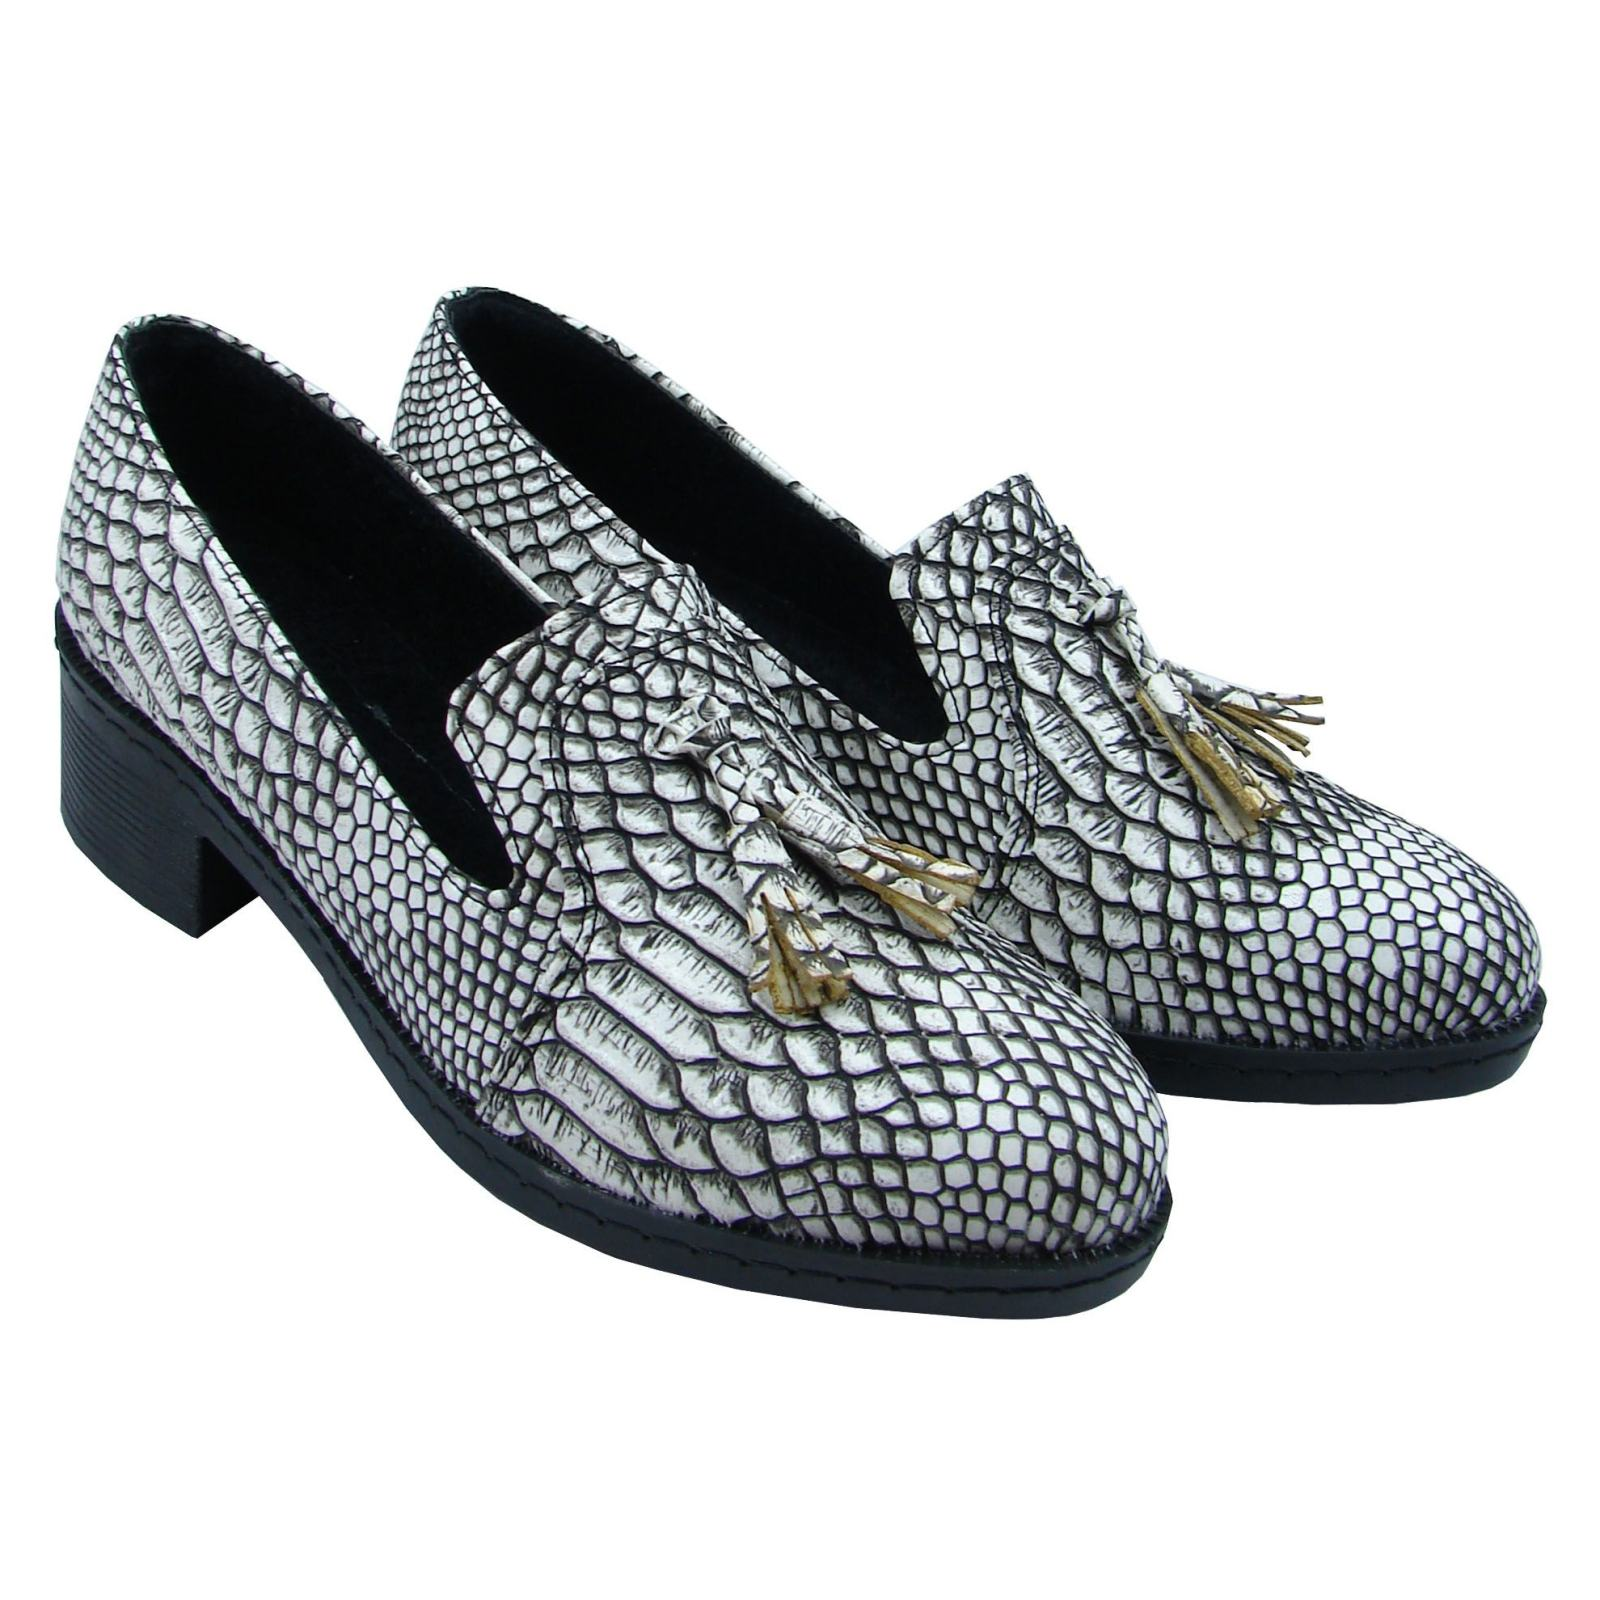 کفش زنانه کد 0024 main 1 1